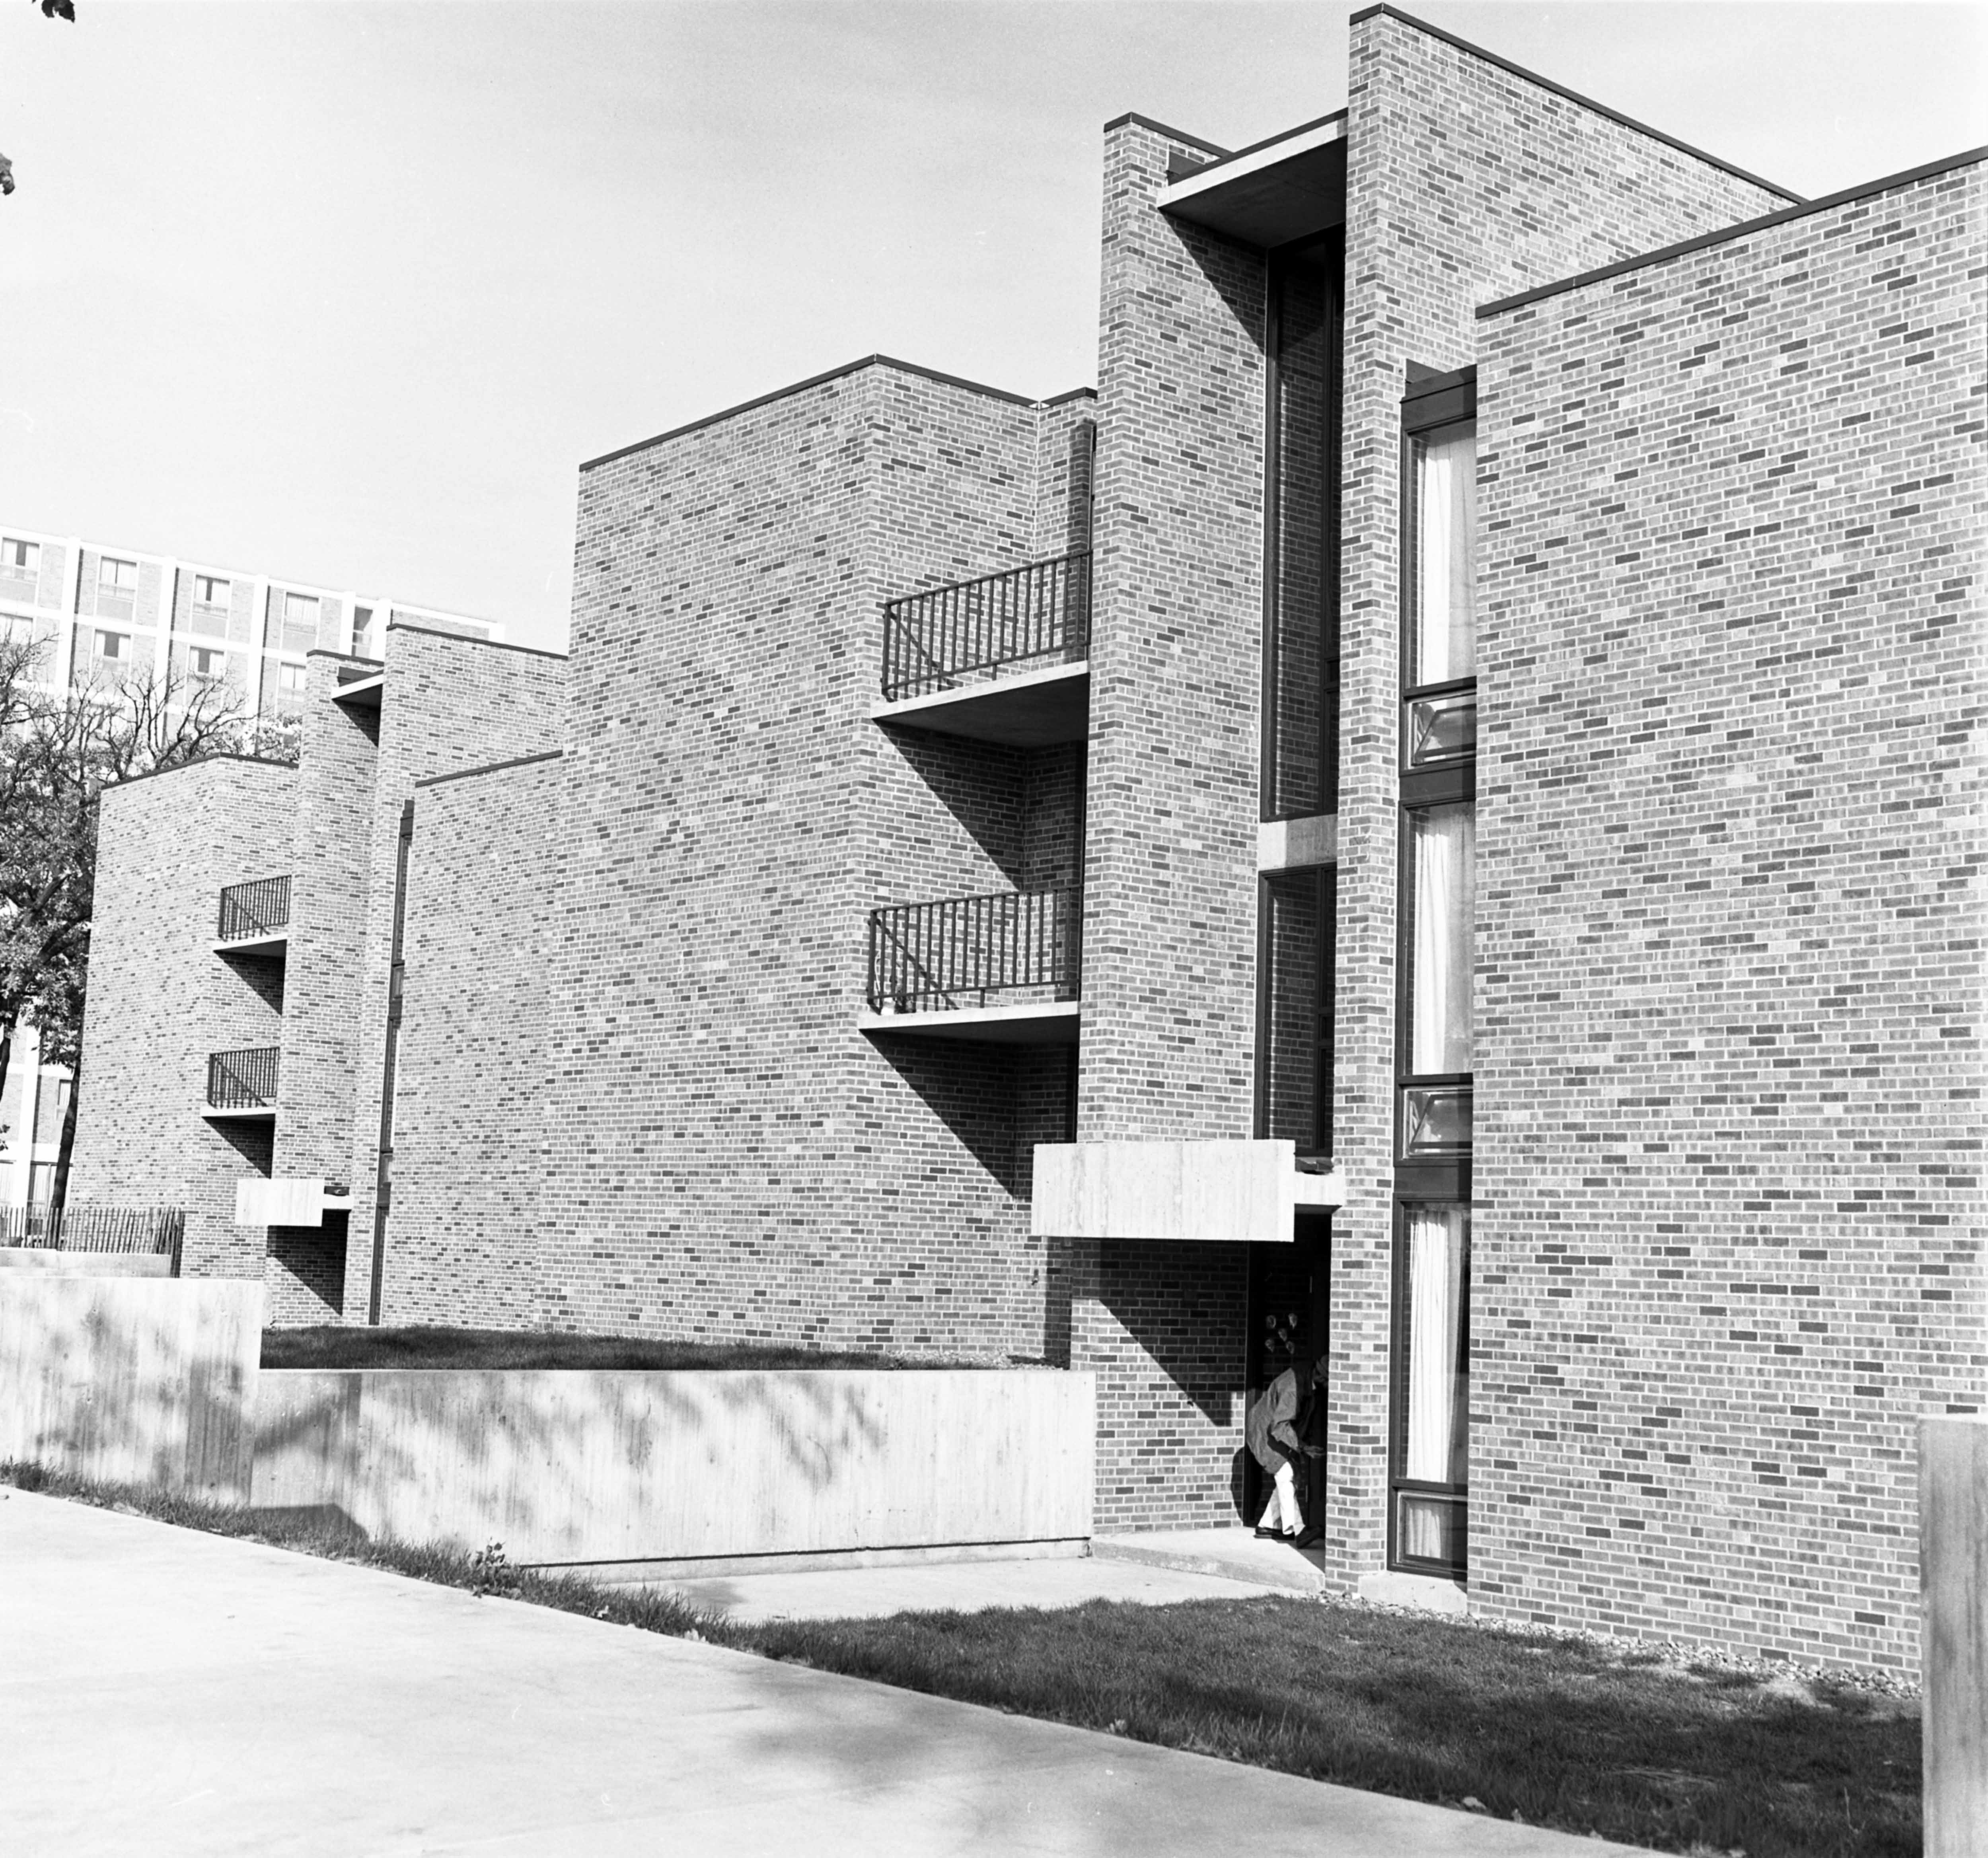 Benton Hall, 1967